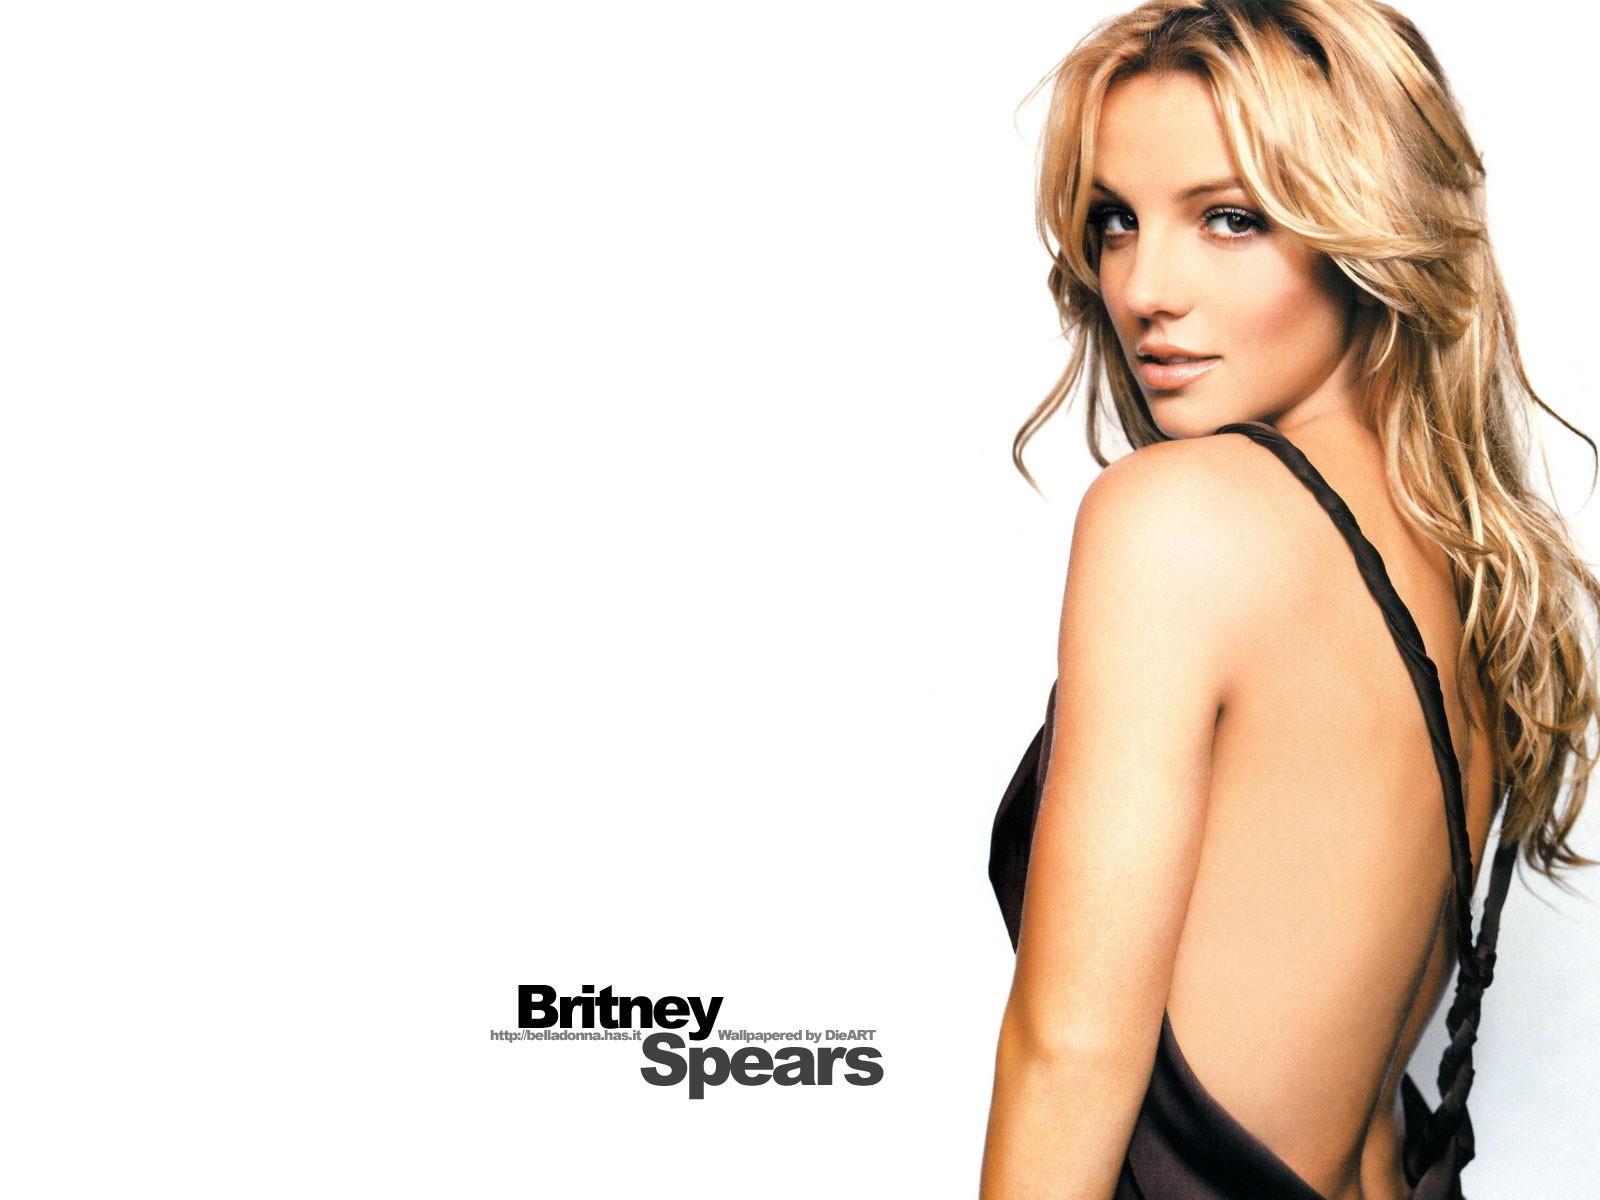 http://3.bp.blogspot.com/-ekJg-VA3_2k/TmRfvtNcWBI/AAAAAAAAE_g/iaPxVrDgILc/s1600/Britney-Spears-487.jpg